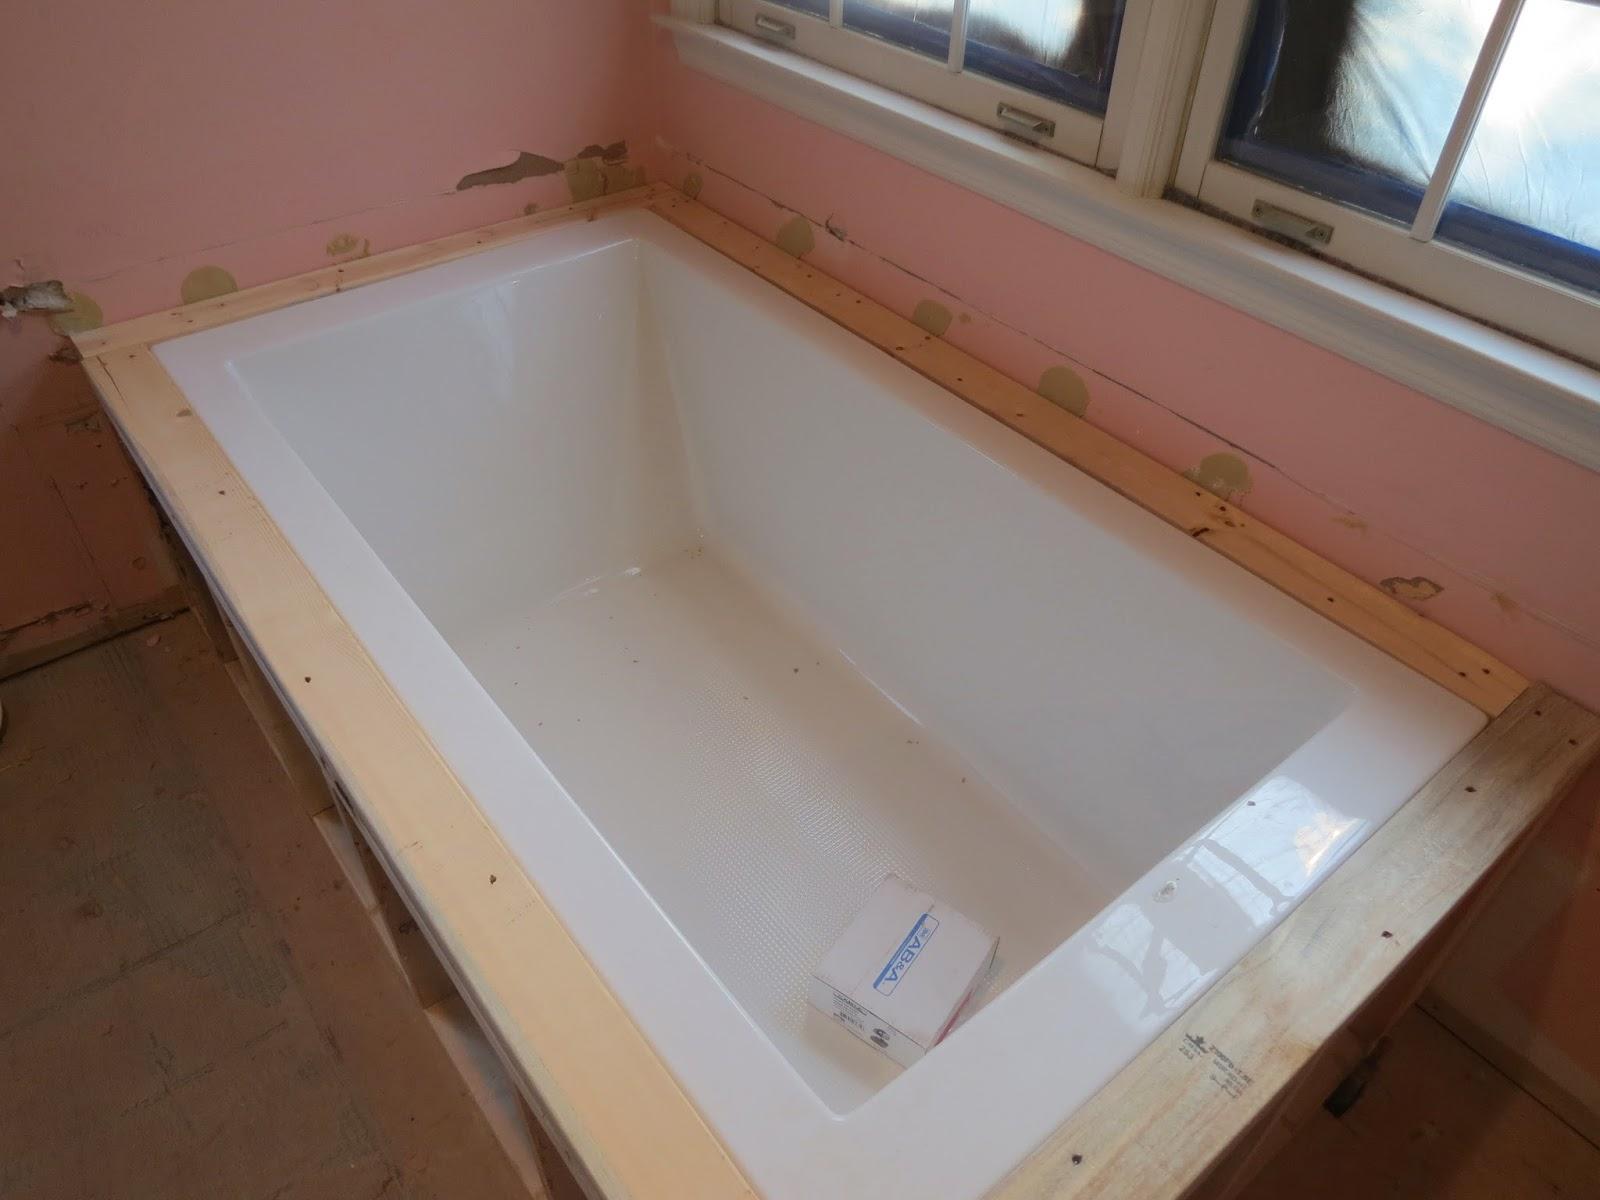 Framing a Tub Surround - Bing images